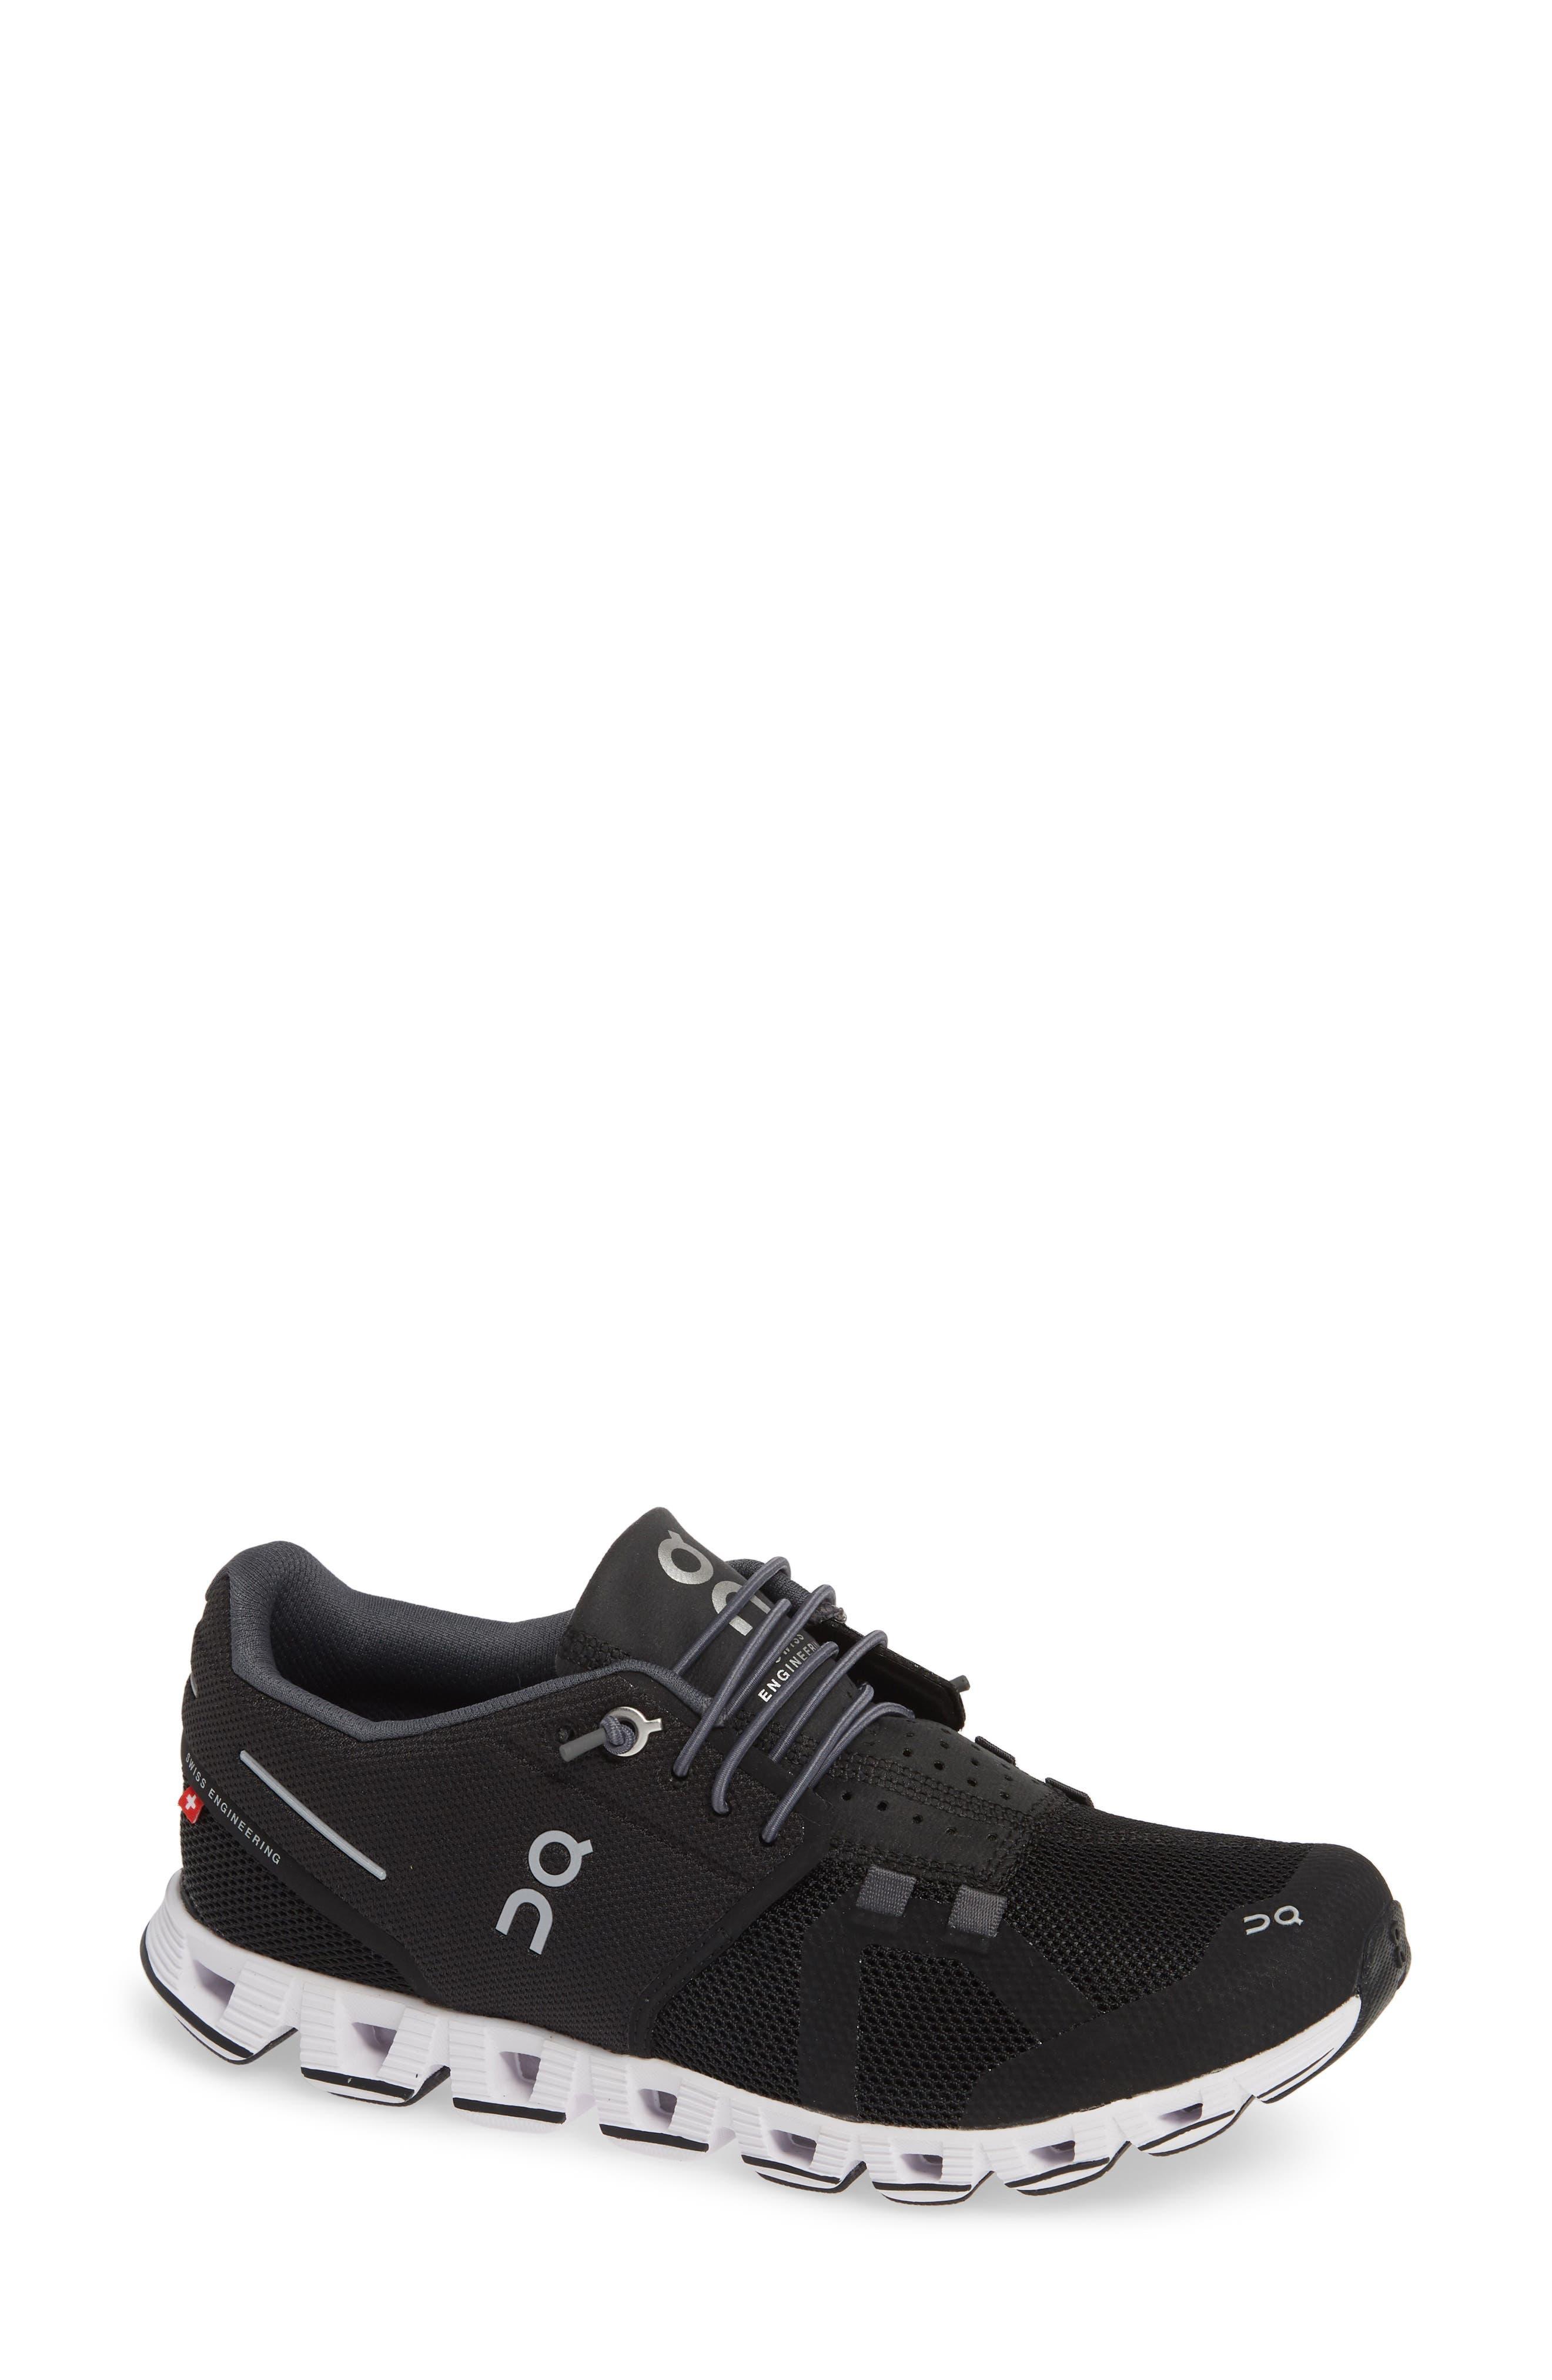 Cloud Running Shoe,                             Main thumbnail 1, color,                             BLACK/ WHITE